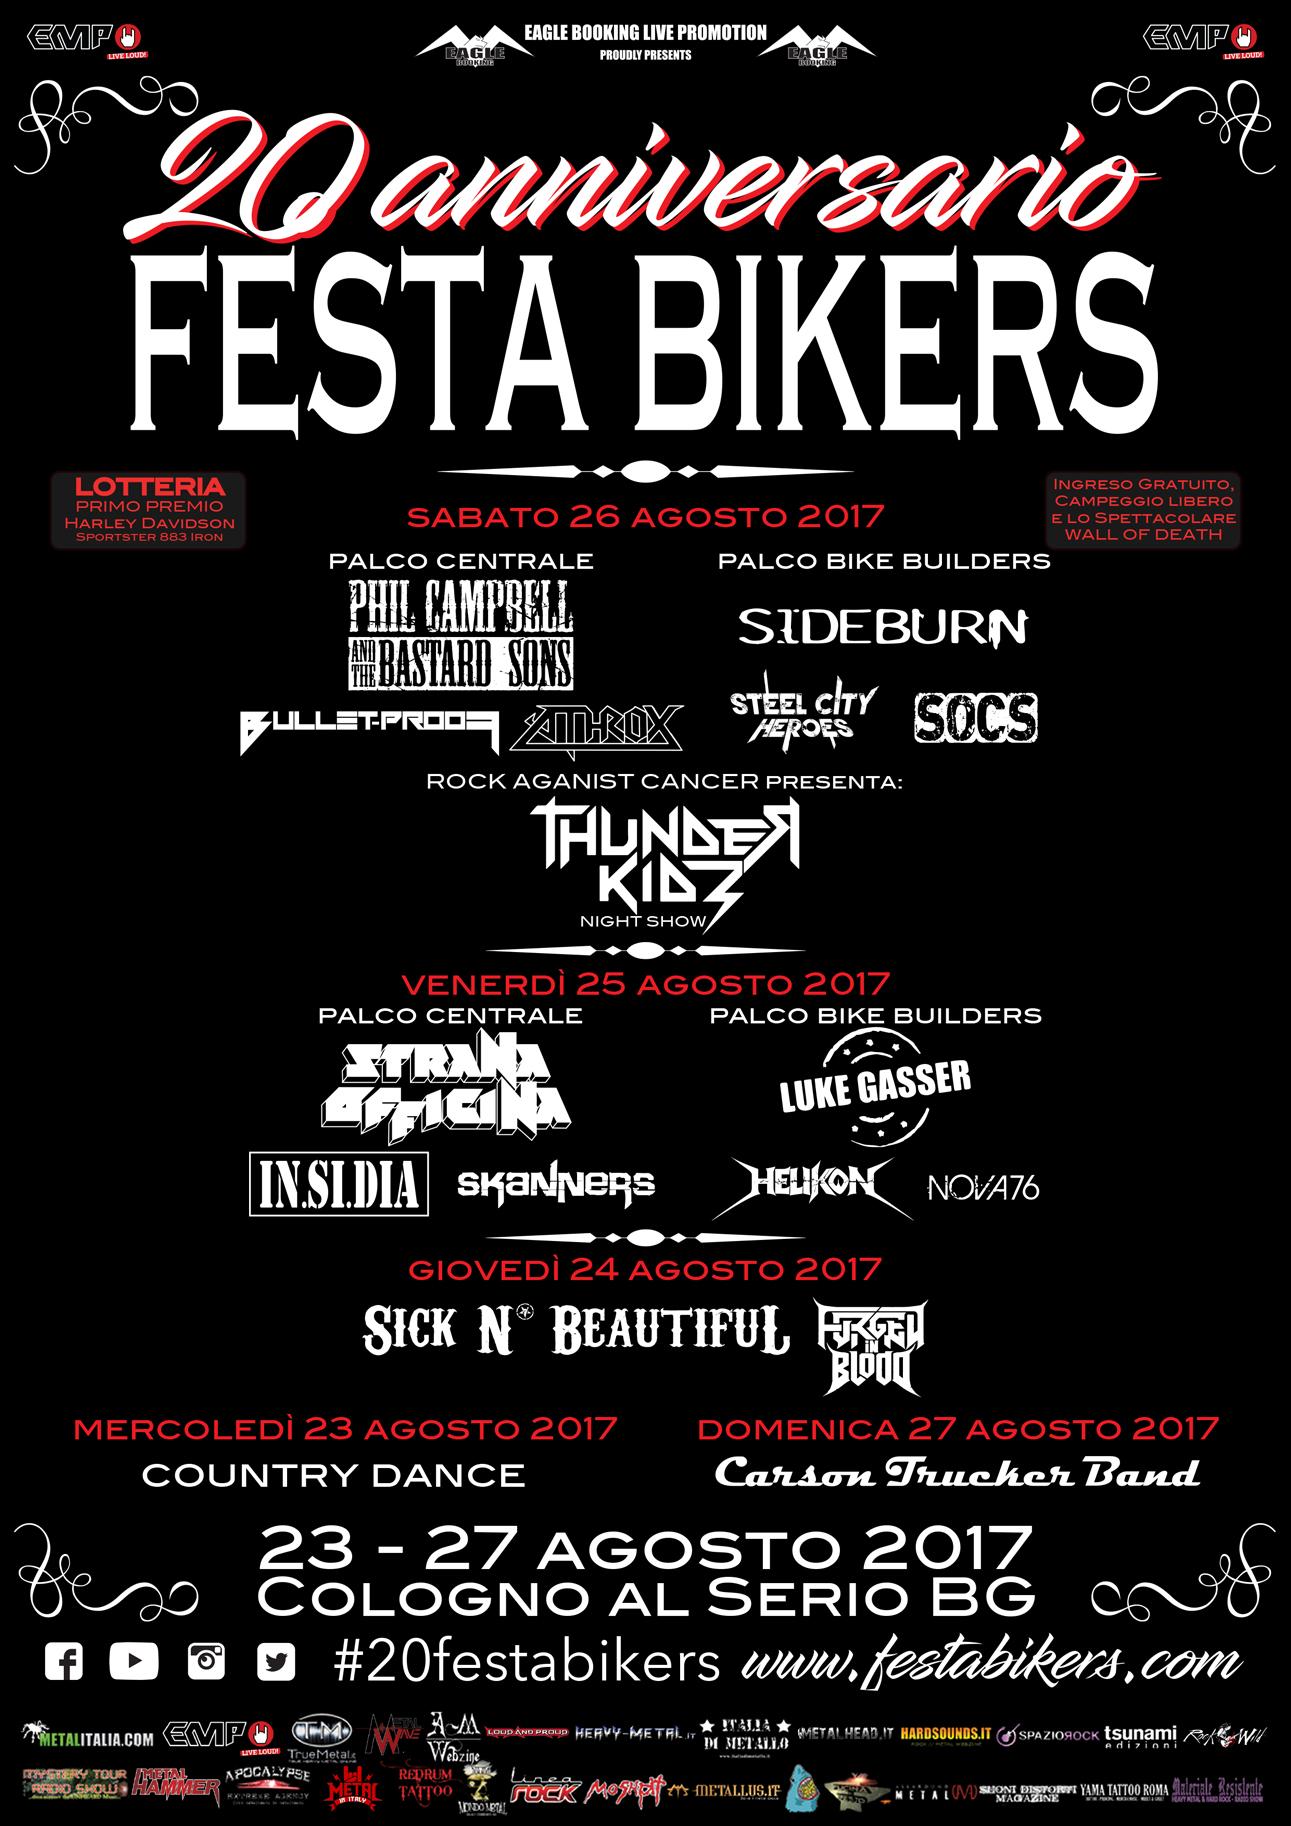 festa-bikers-2017_5